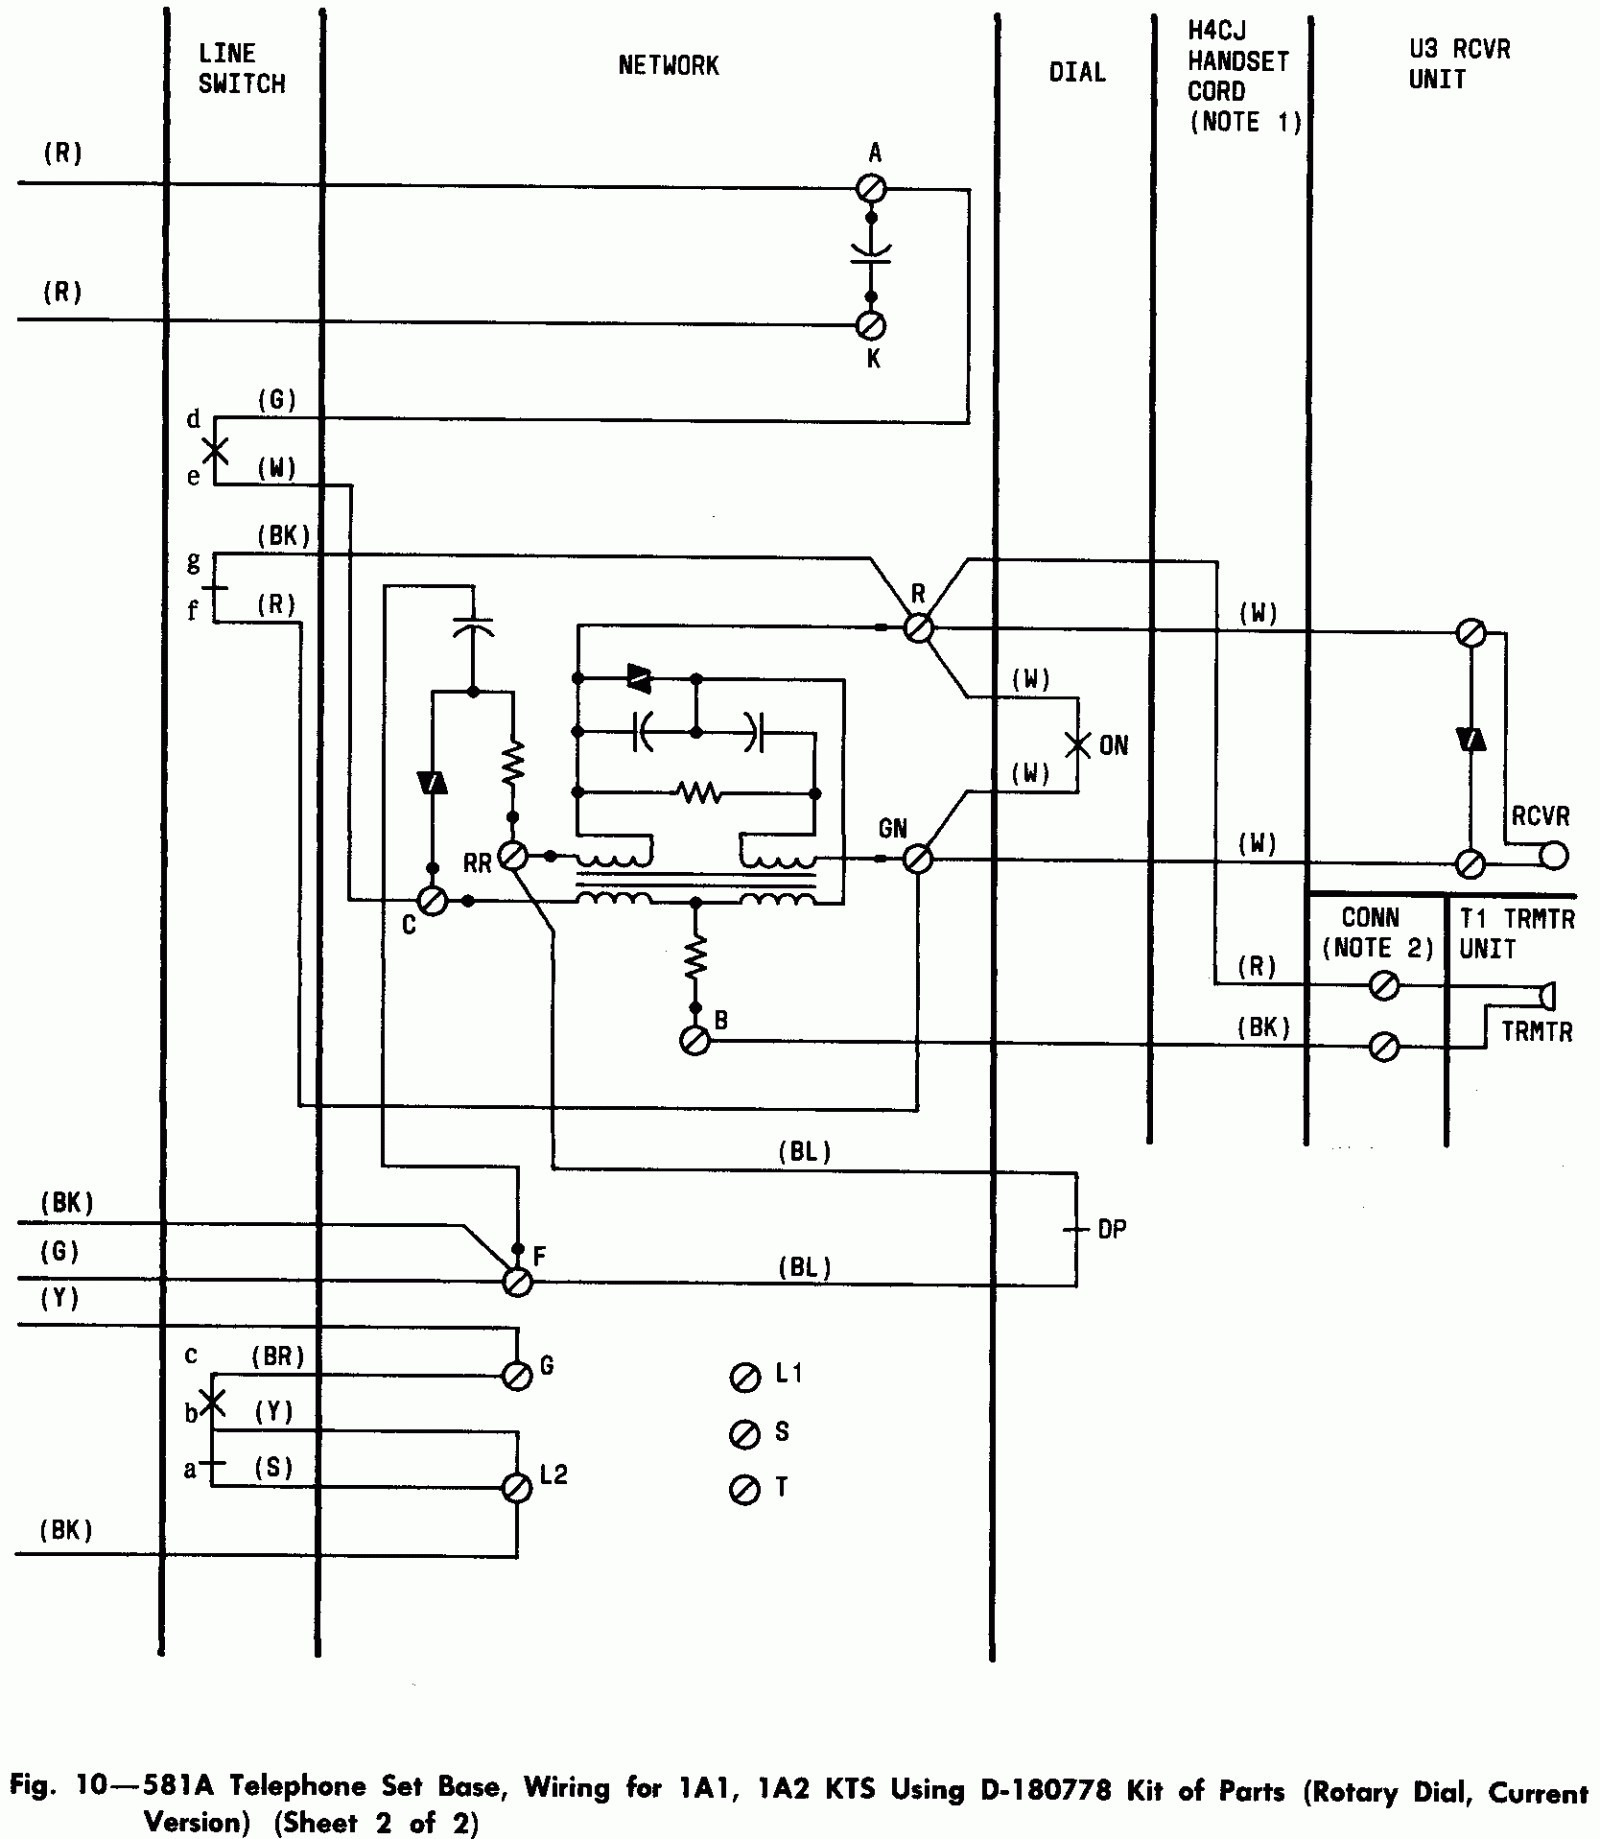 Telephone Extension Wiring Diagram Uk Wiring Diagram